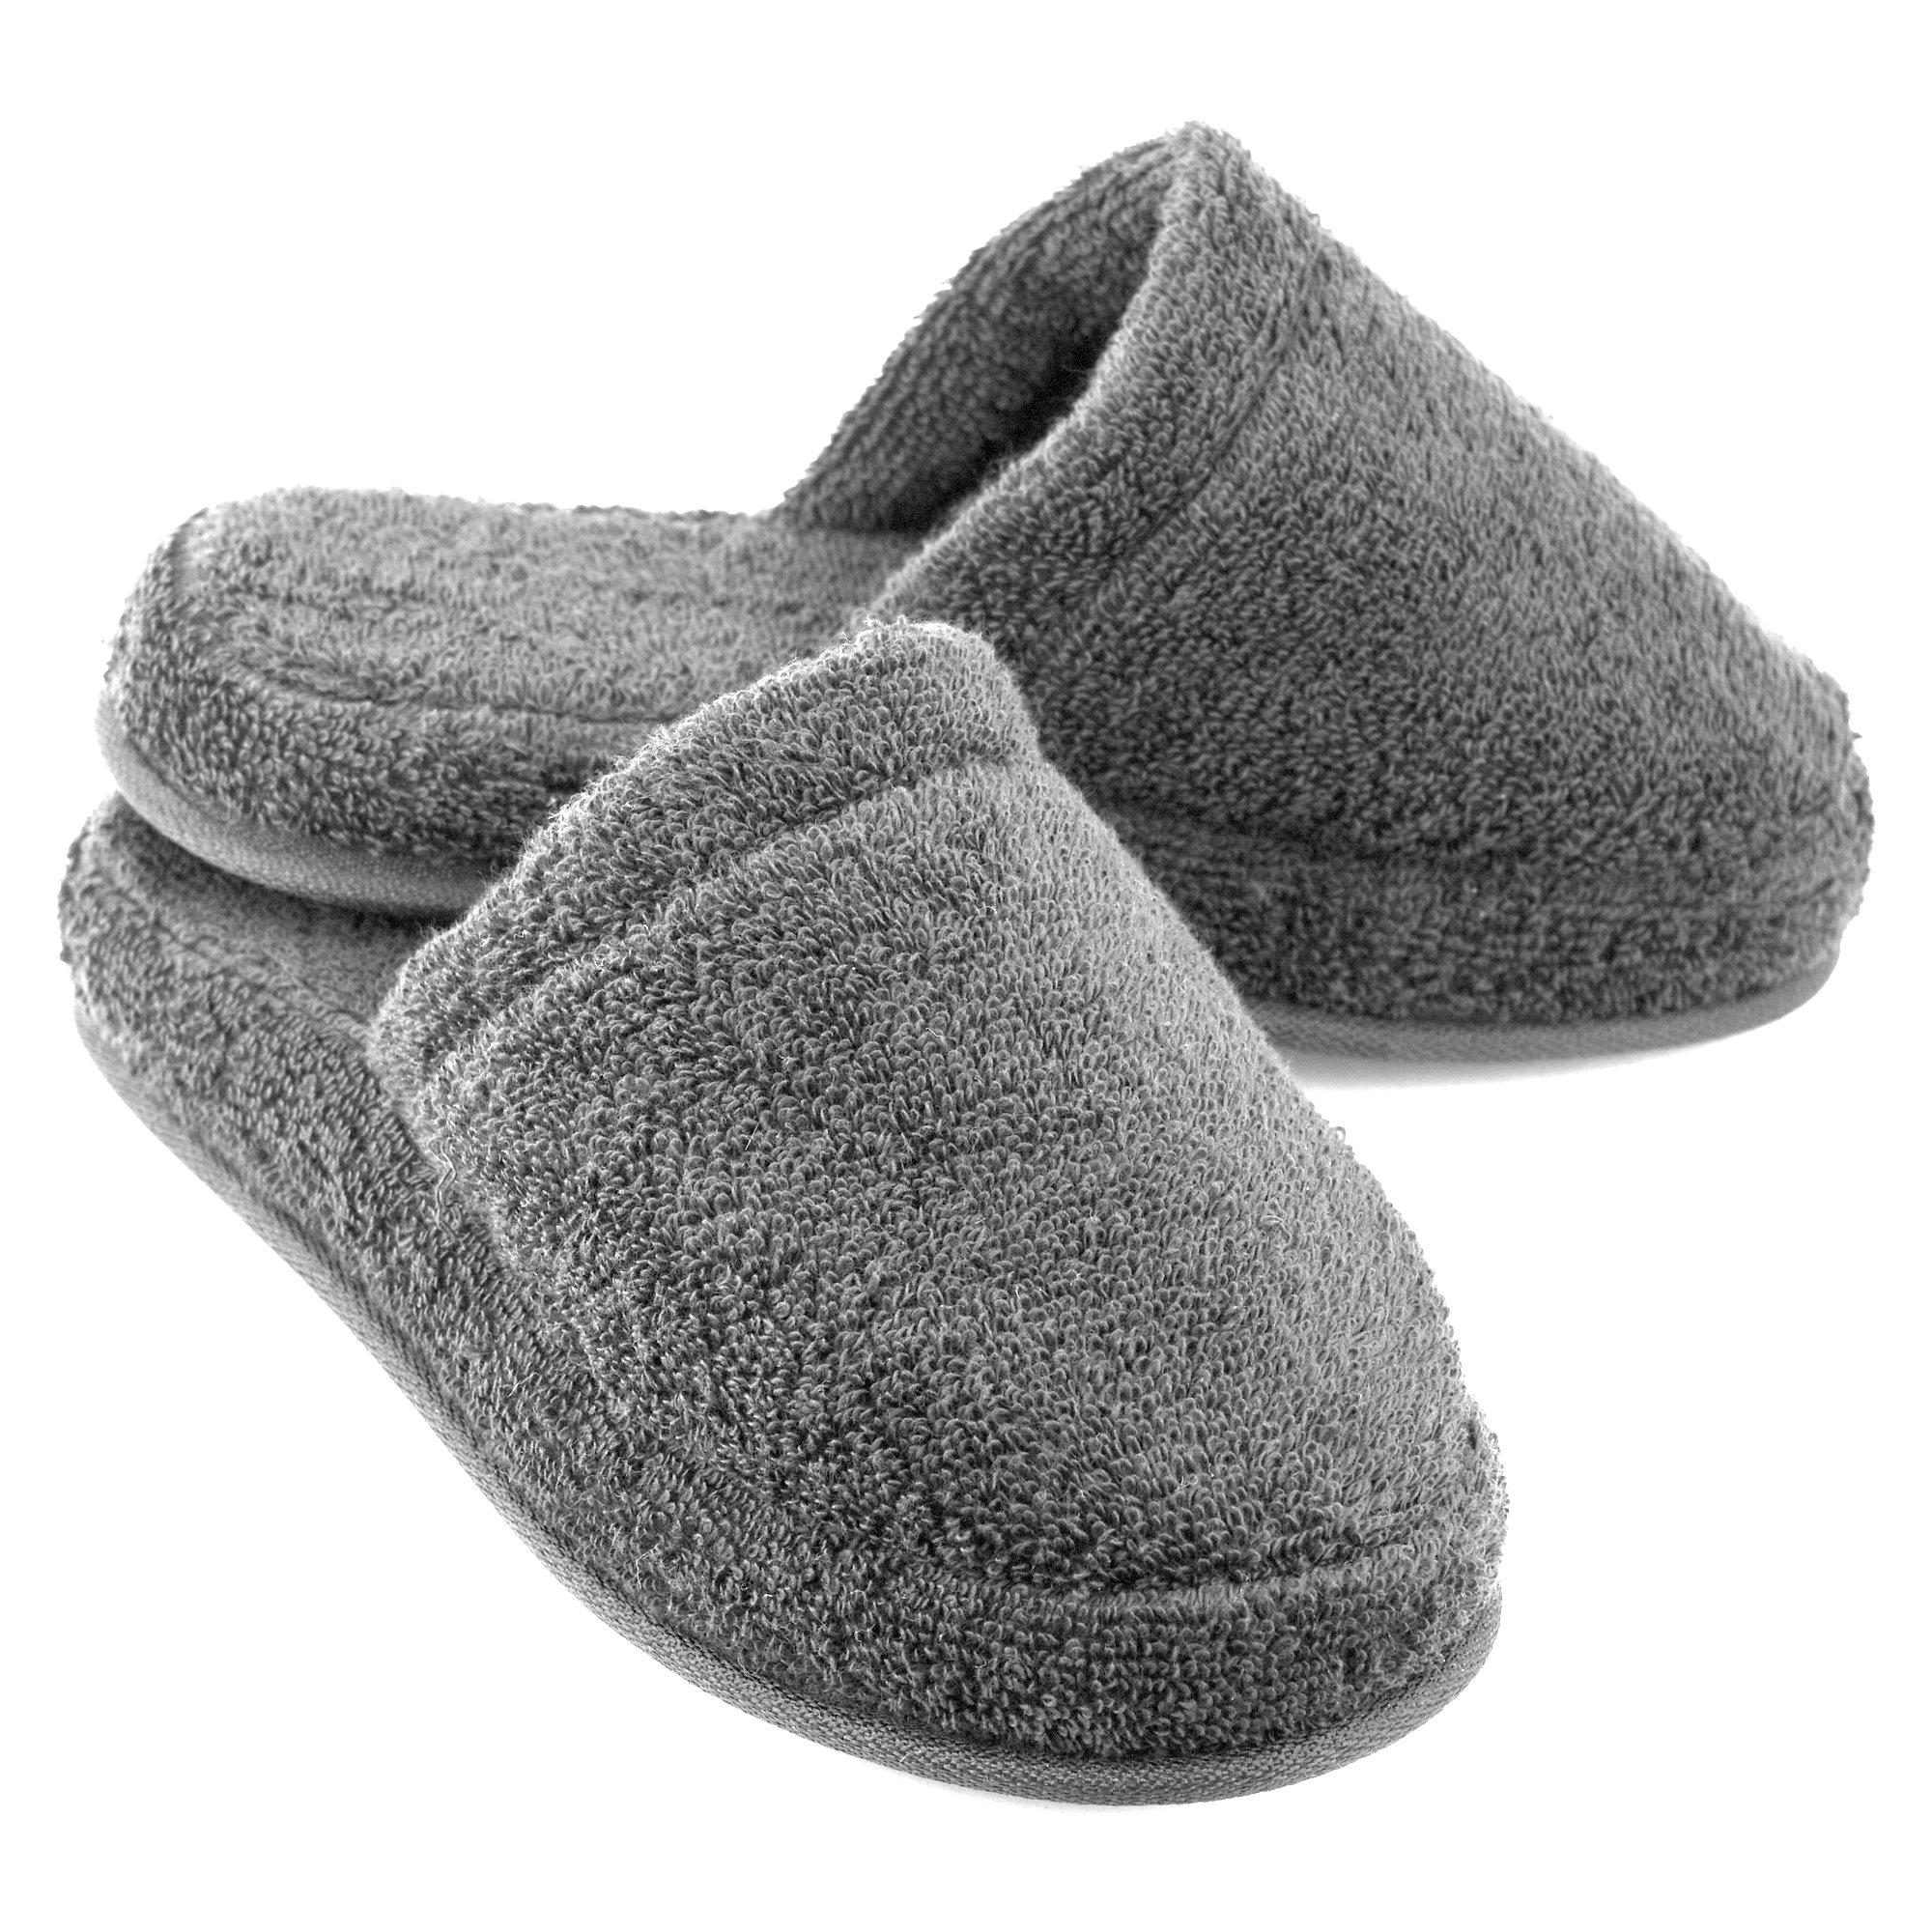 EuropeanSoftest Women's Cozy Memory Foam Premium 100% Turkish Terry Cotton Cloth Spa House Indoor Slipper (Medium / 7-8 B(M) US, Gray)